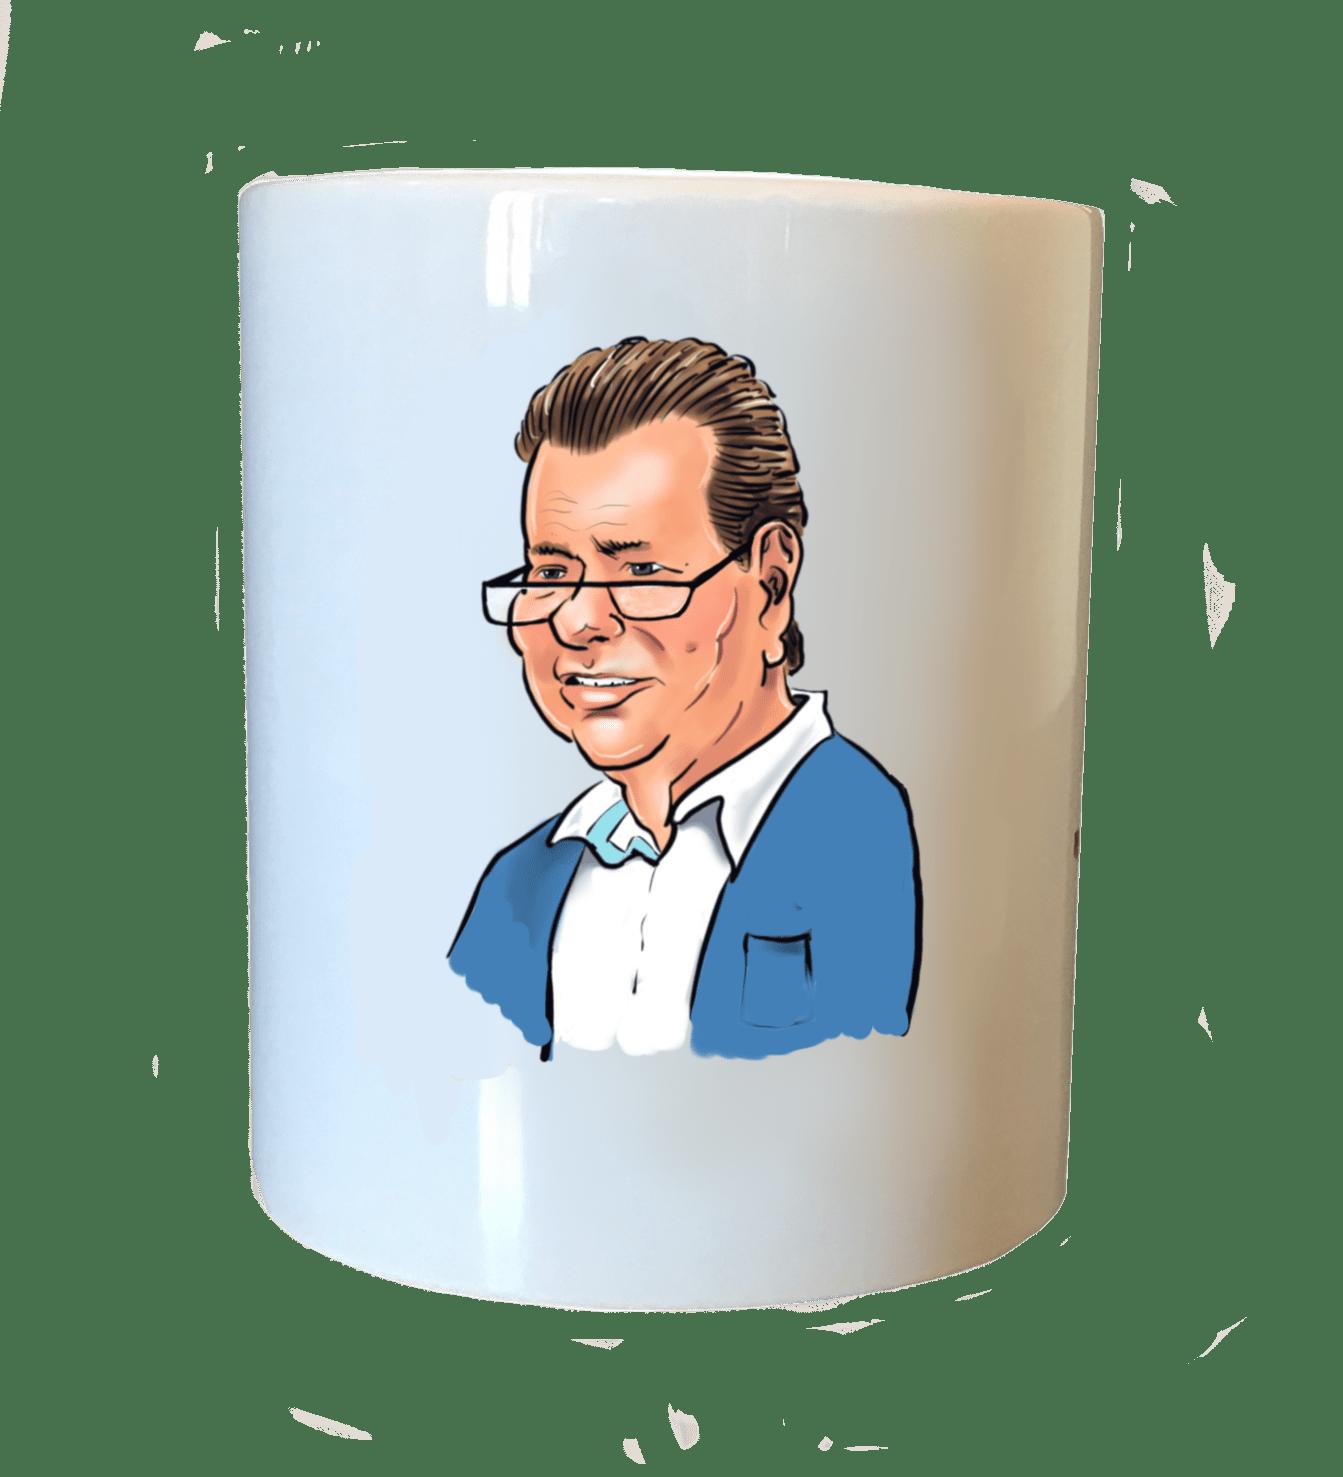 Willem van der Kolk | klant Rinie van Driel